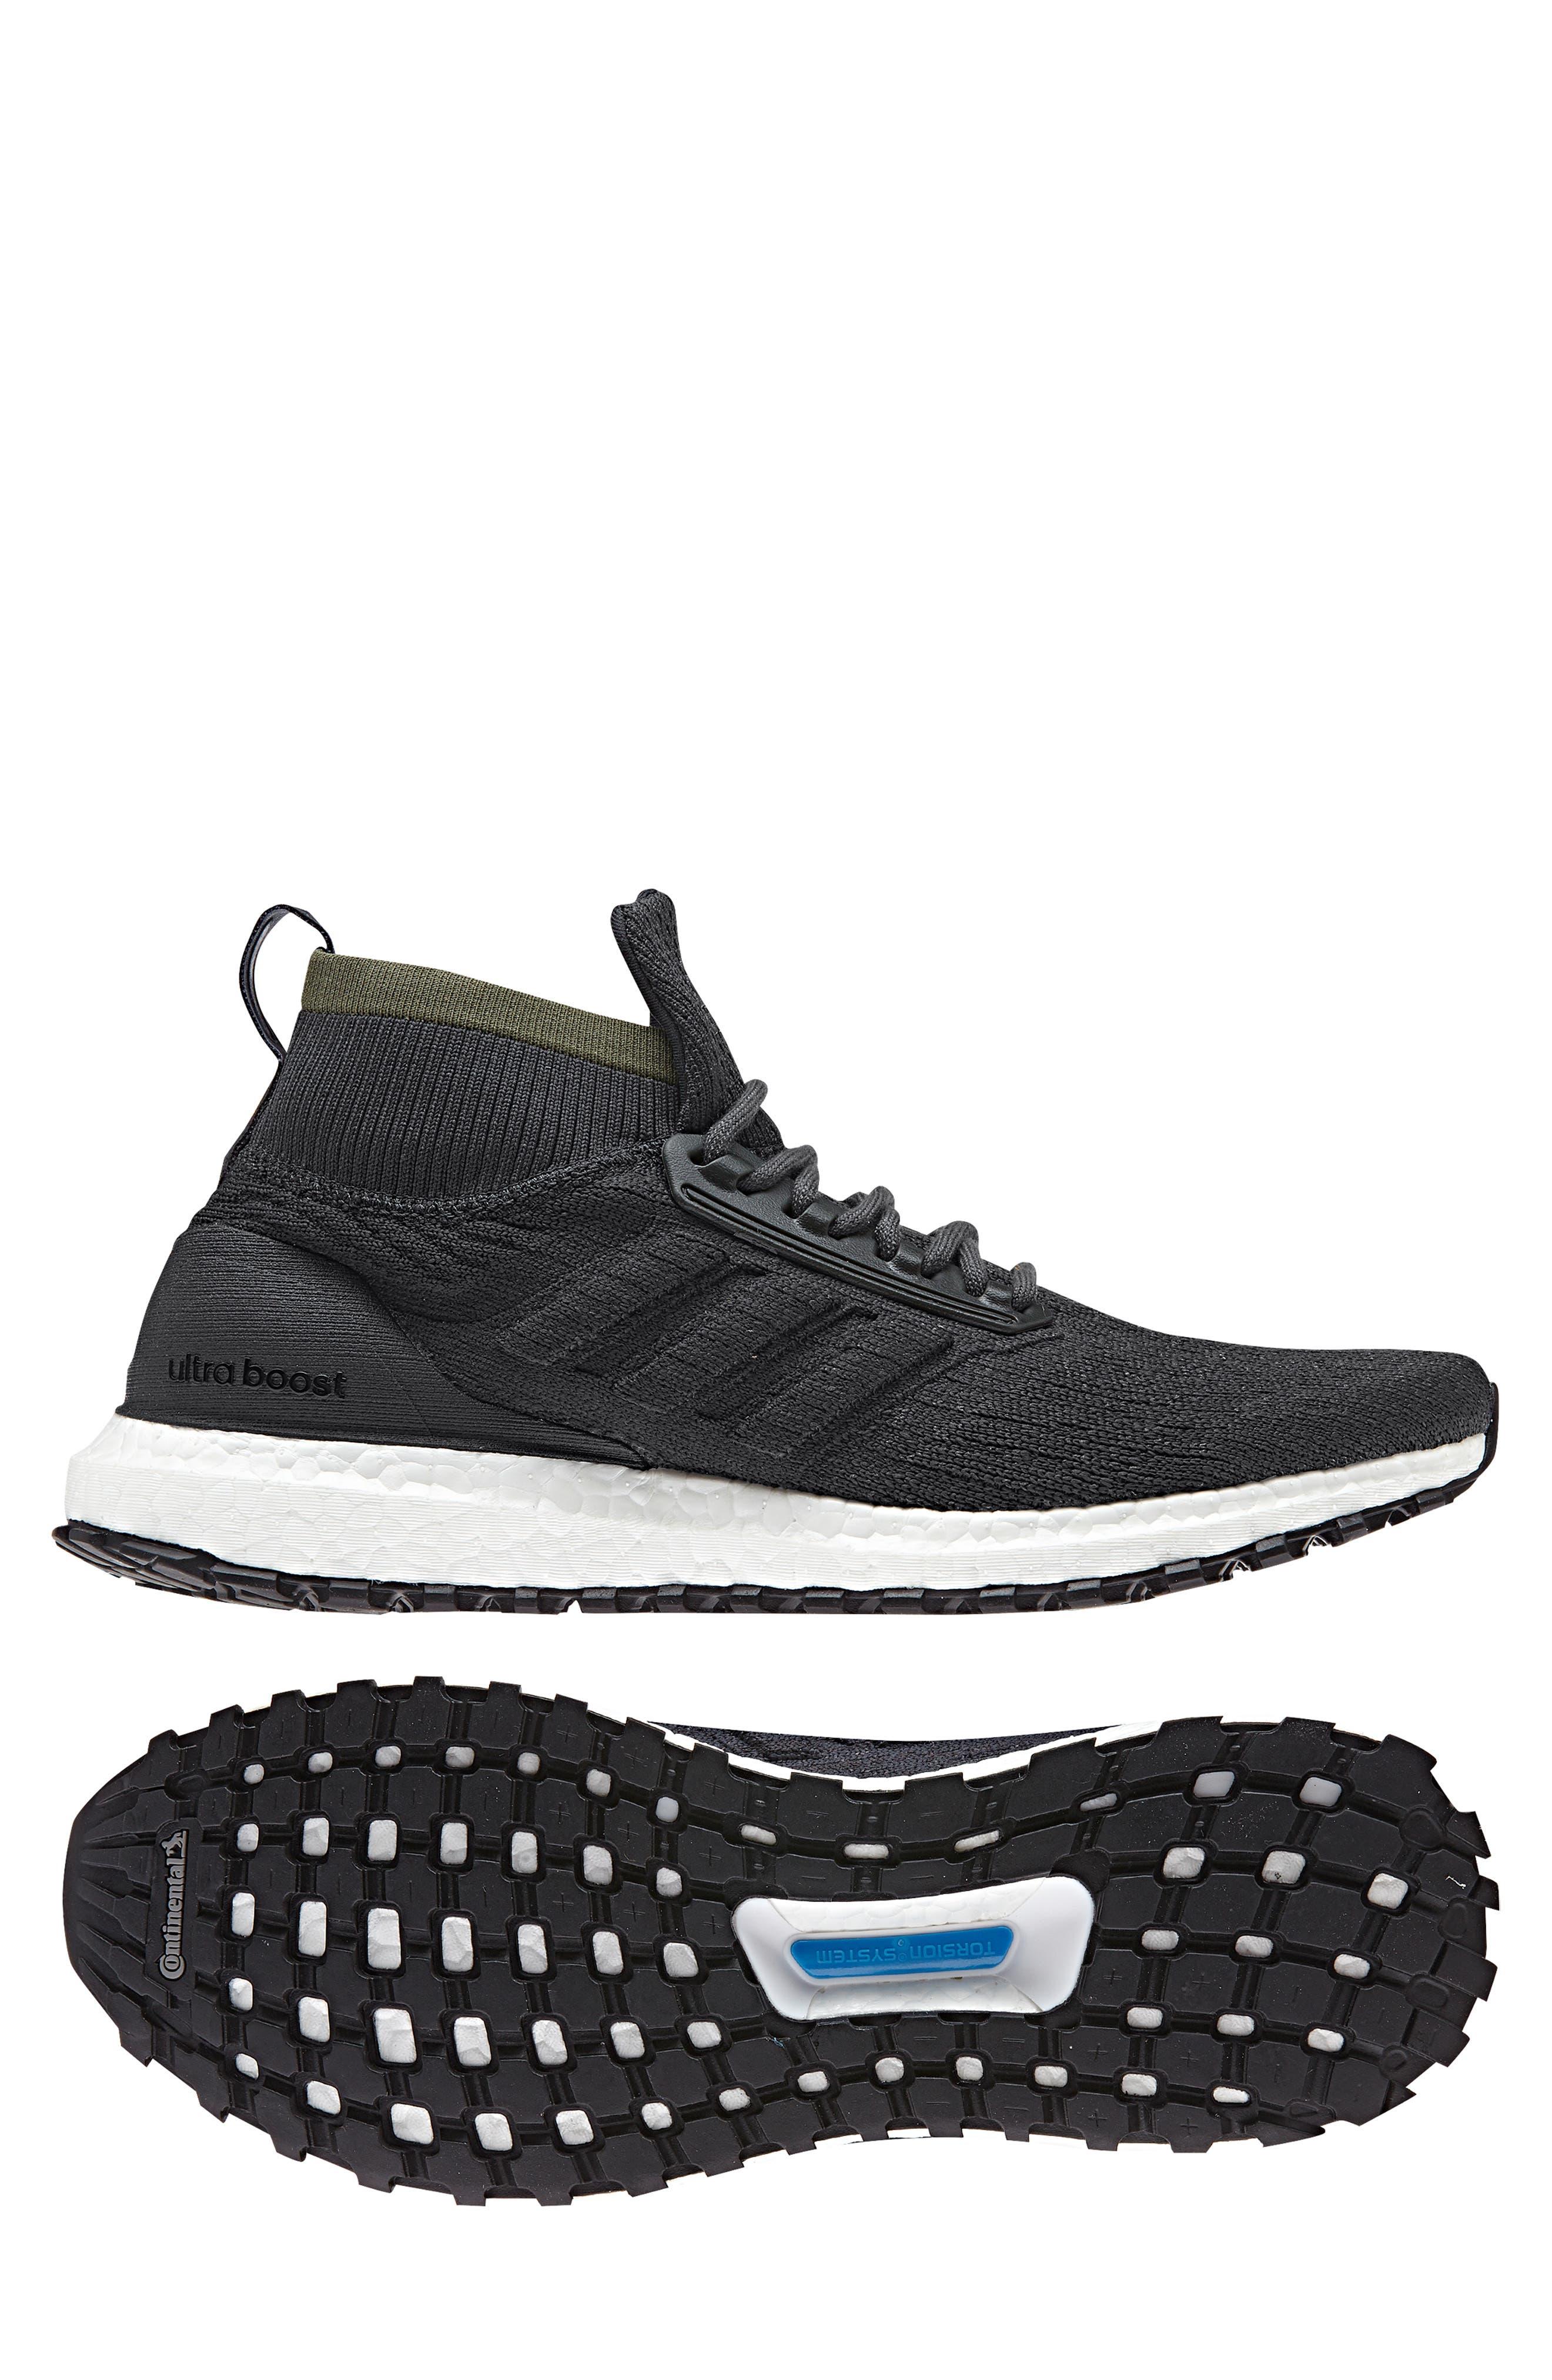 UltraBoost All Terrain Water Resistant Running Shoe,                             Alternate thumbnail 11, color,                             CARBON / CORE BLACK / WHITE